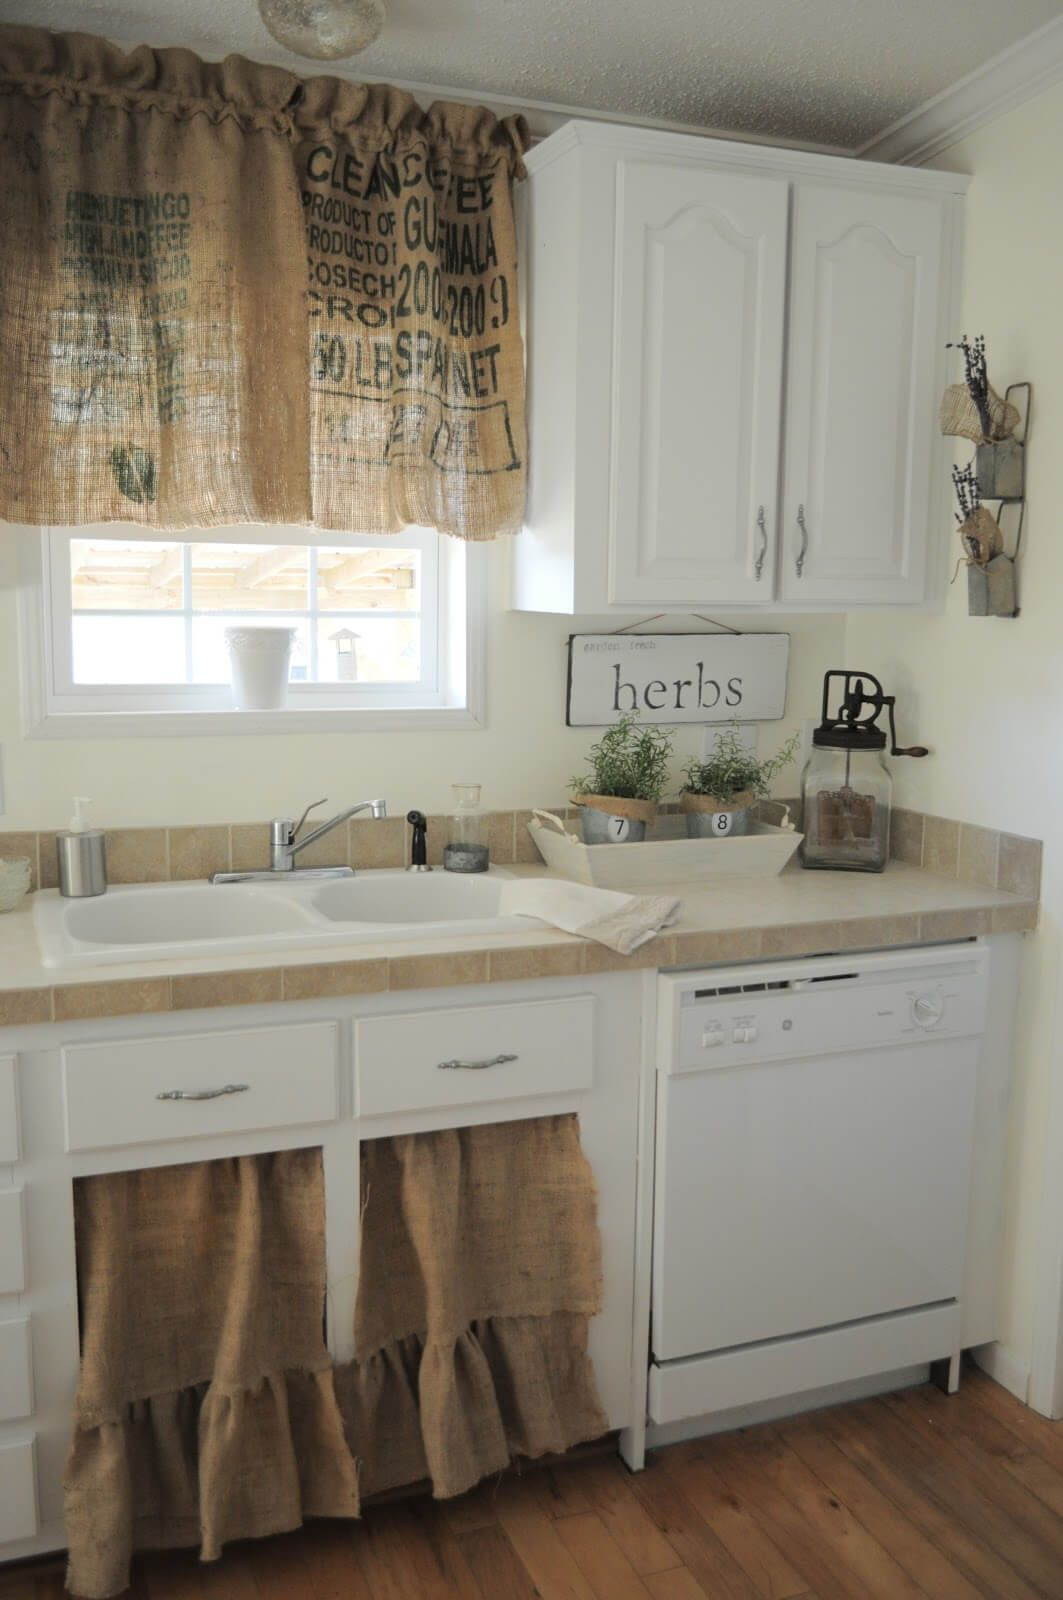 24 Unique Kitchen Cabinet Curtain Ideas For An Adorable Home Decor Style Kuchenschrank Kuche Dekoration Wand